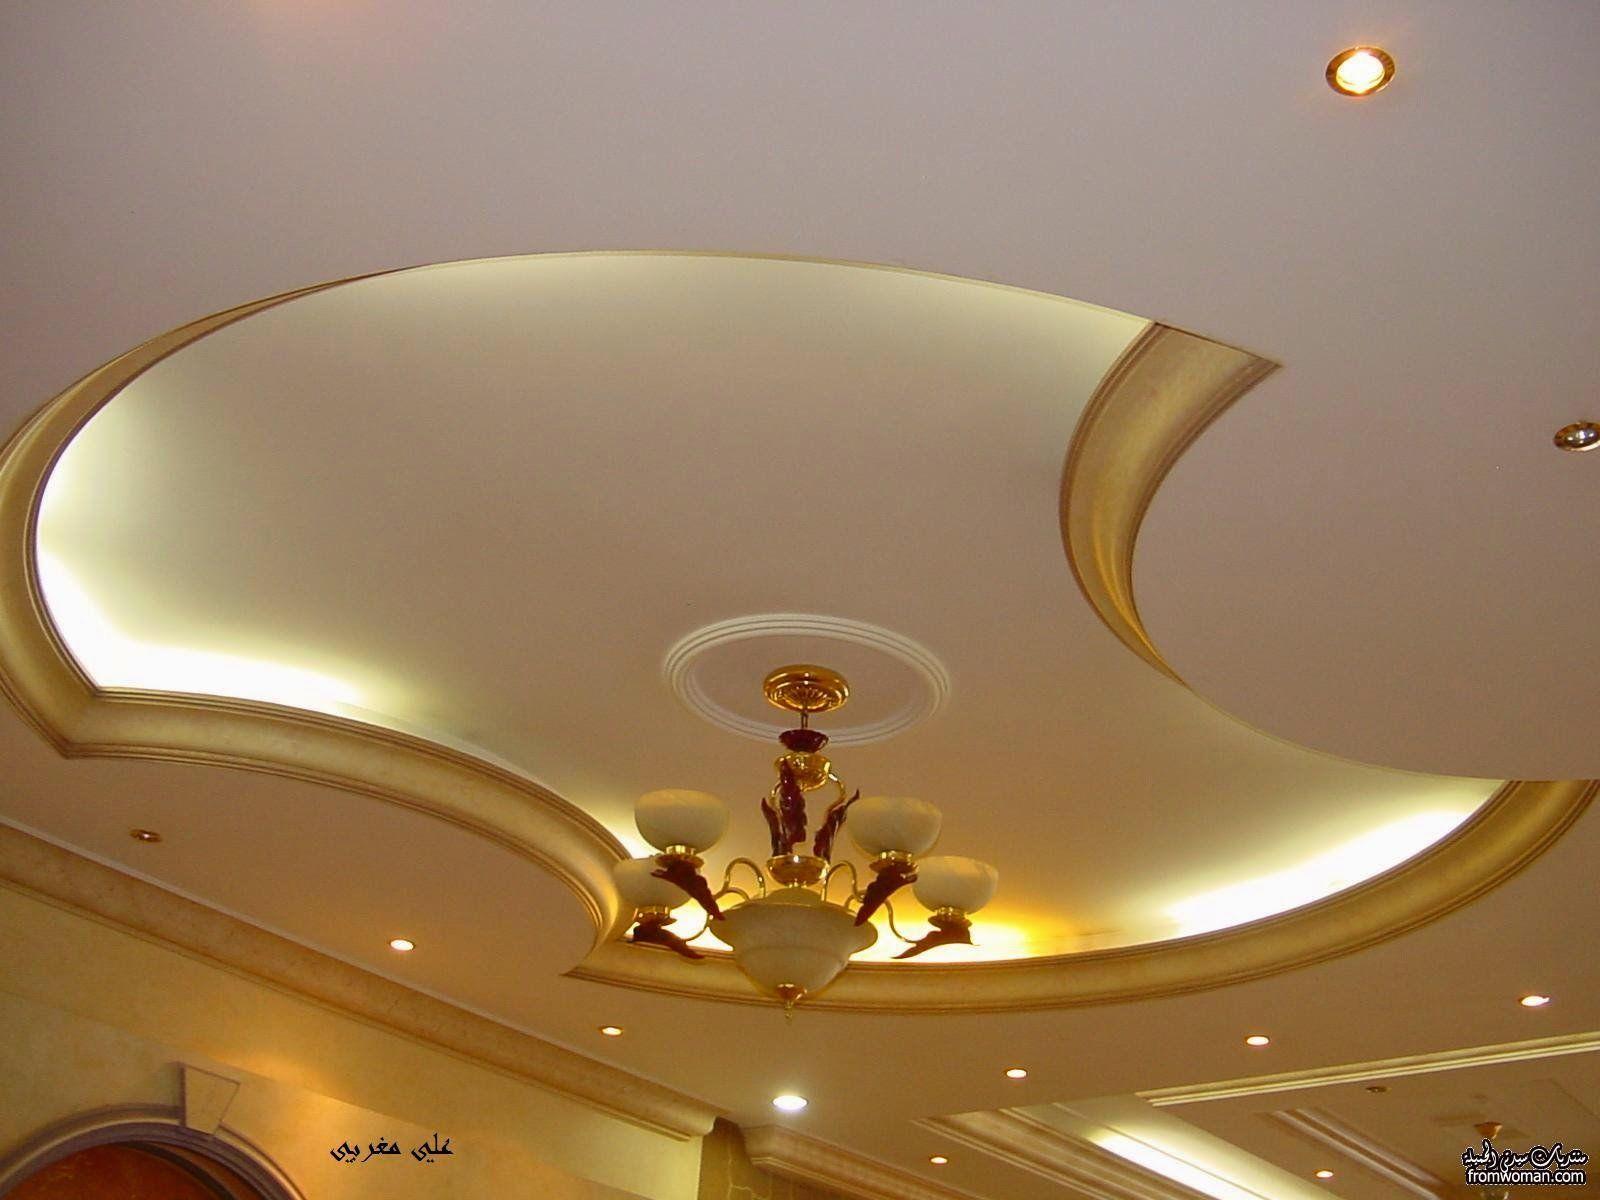 Curved Gypsum Ceiling Designs For Living Room 2015 Gypsum Ceiling